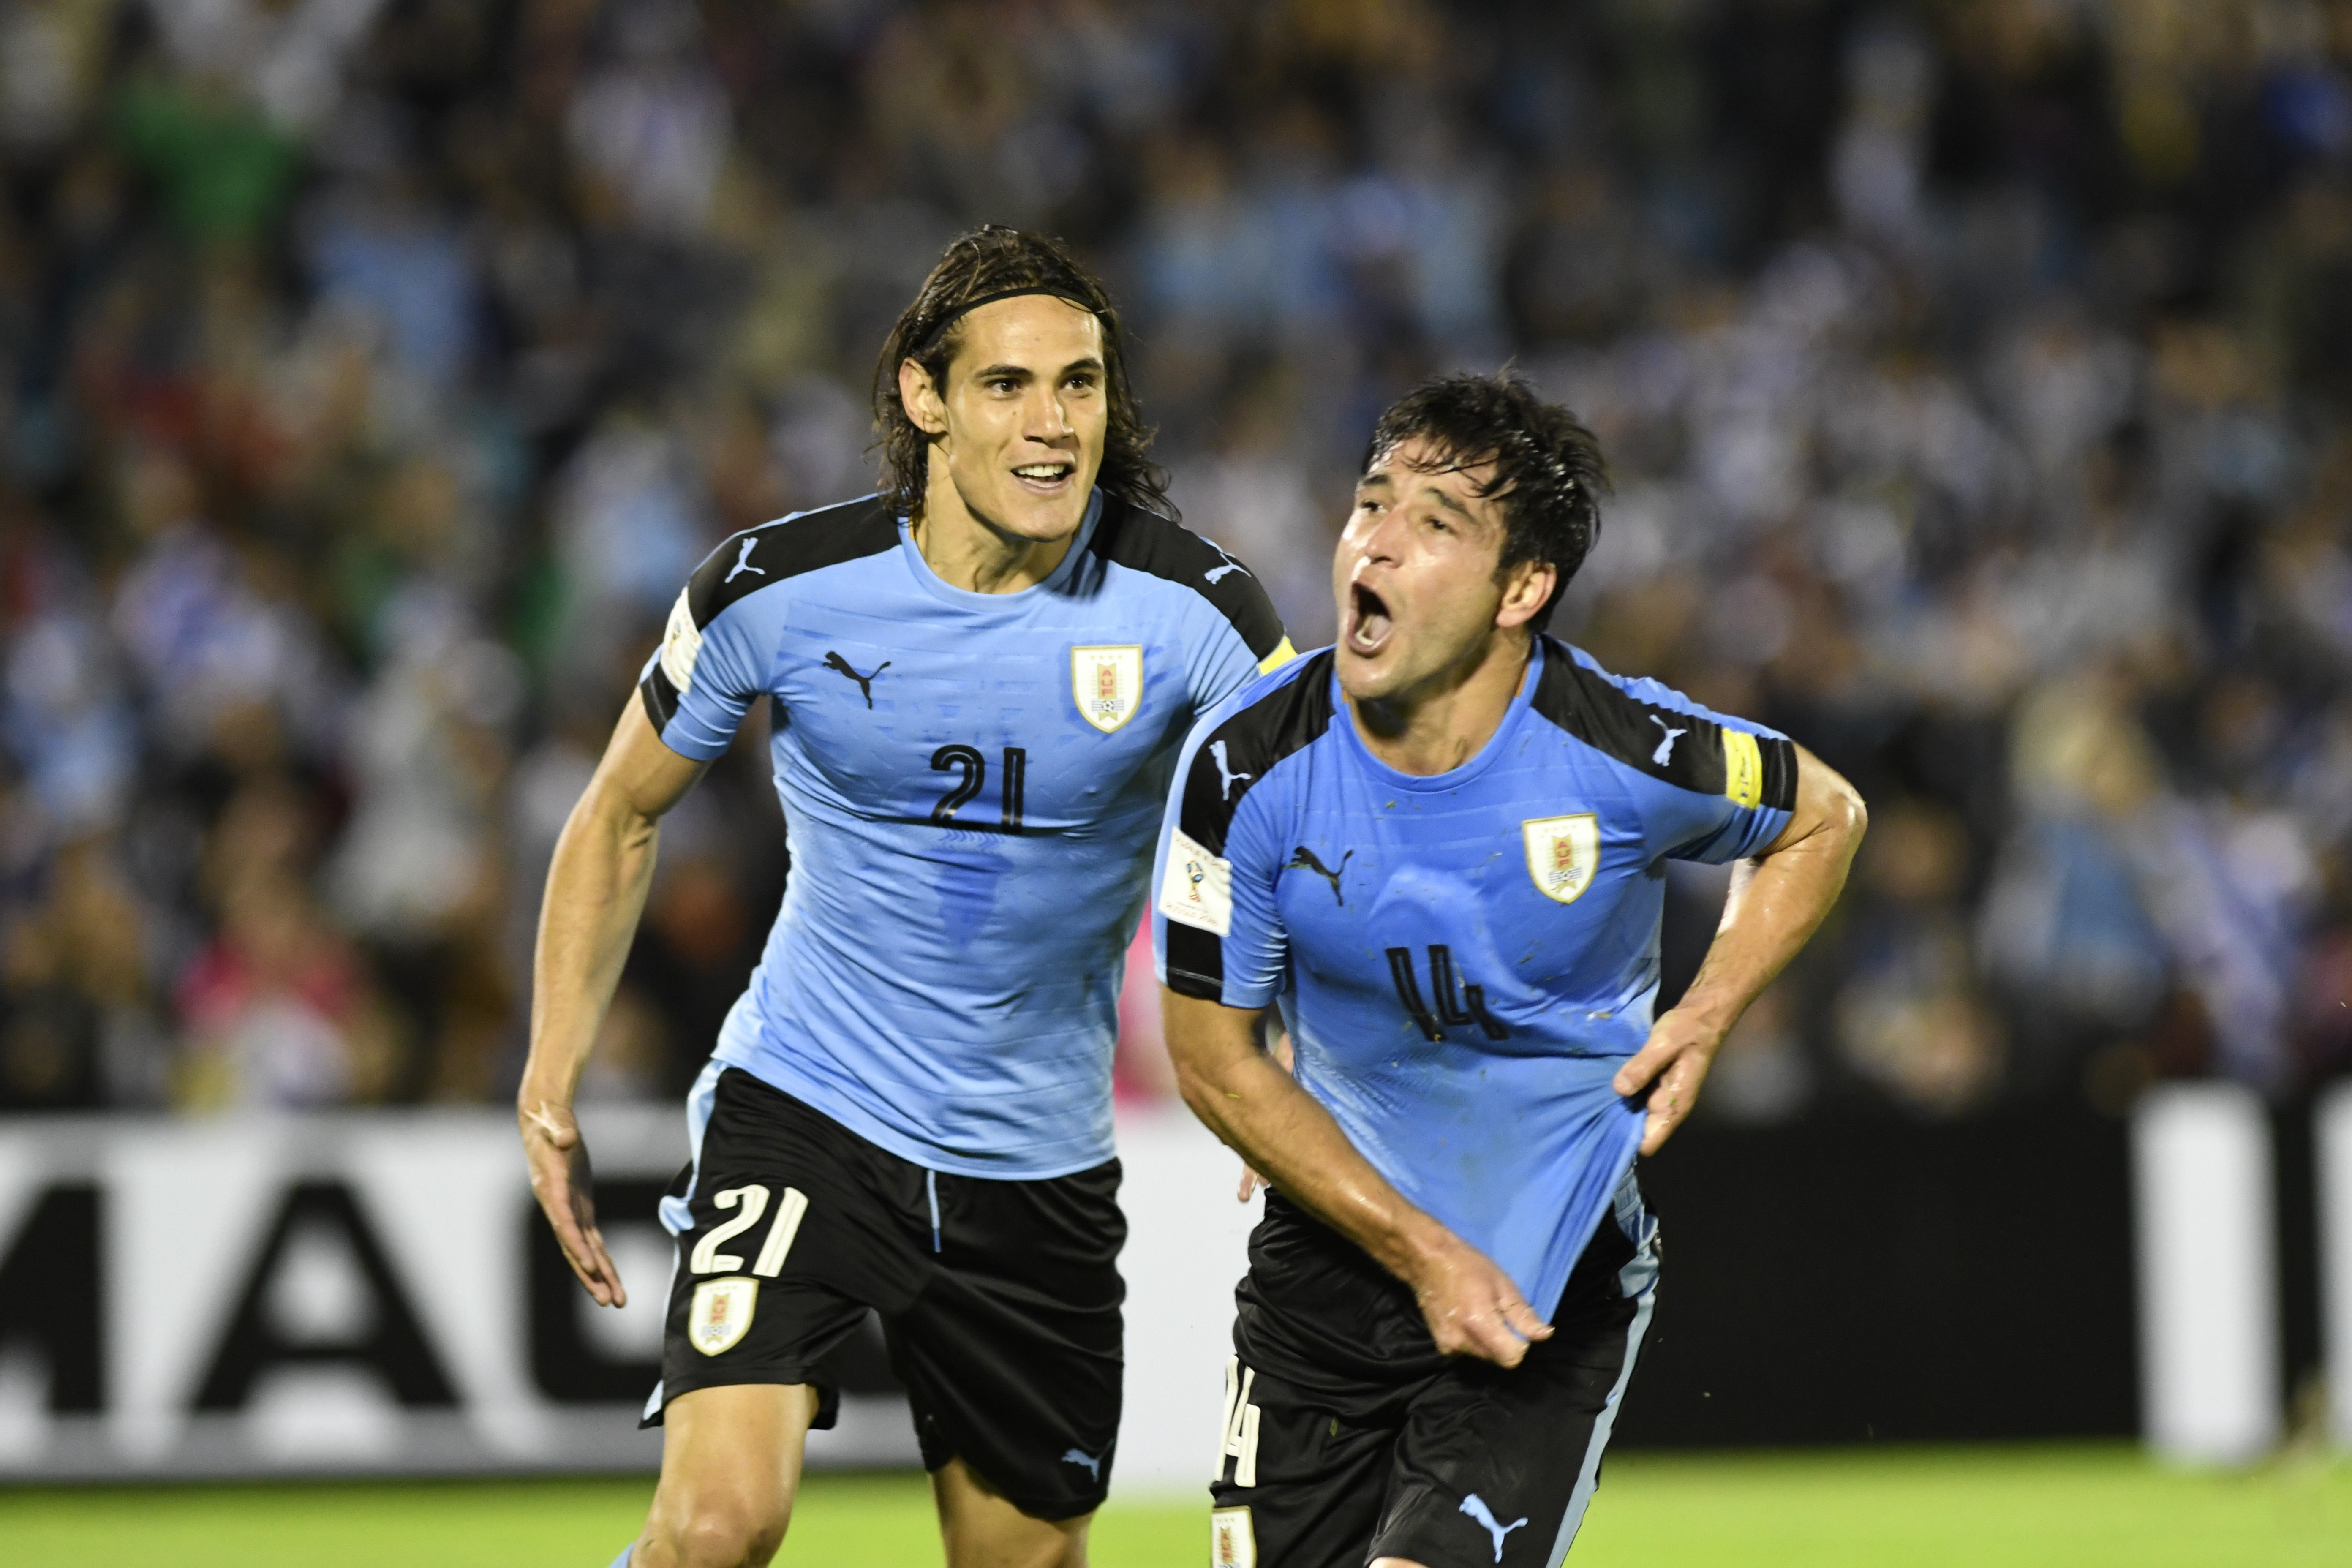 Cruz Azul, Nicolás Lodeiro, Uruguay, Refuerzo Los Pleyers